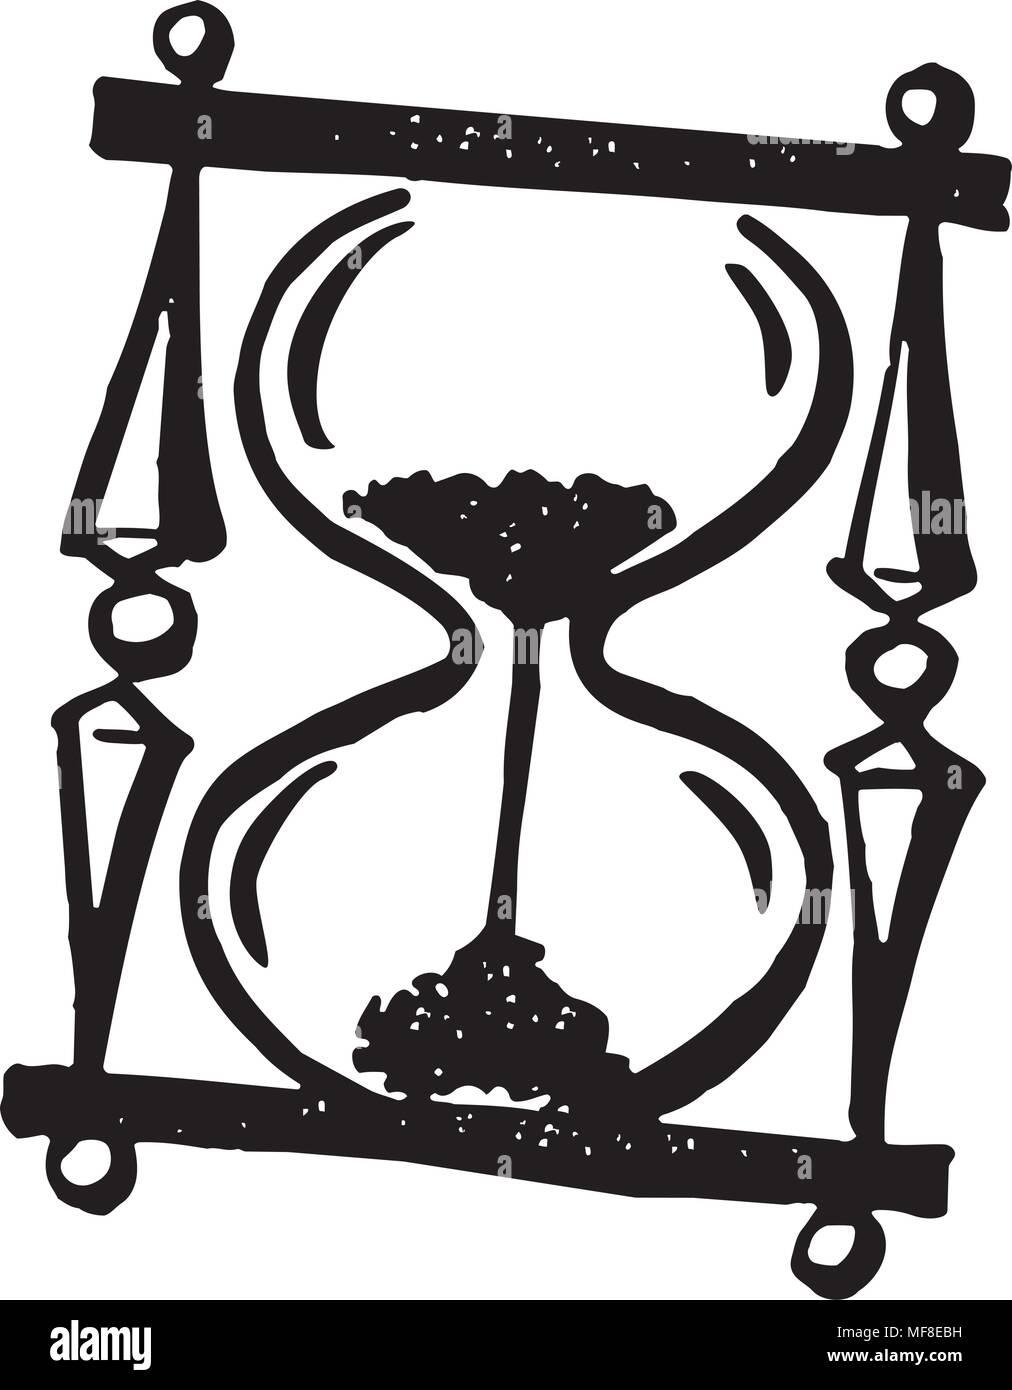 Hourglass - Retro Clipart Illustration - Stock Image